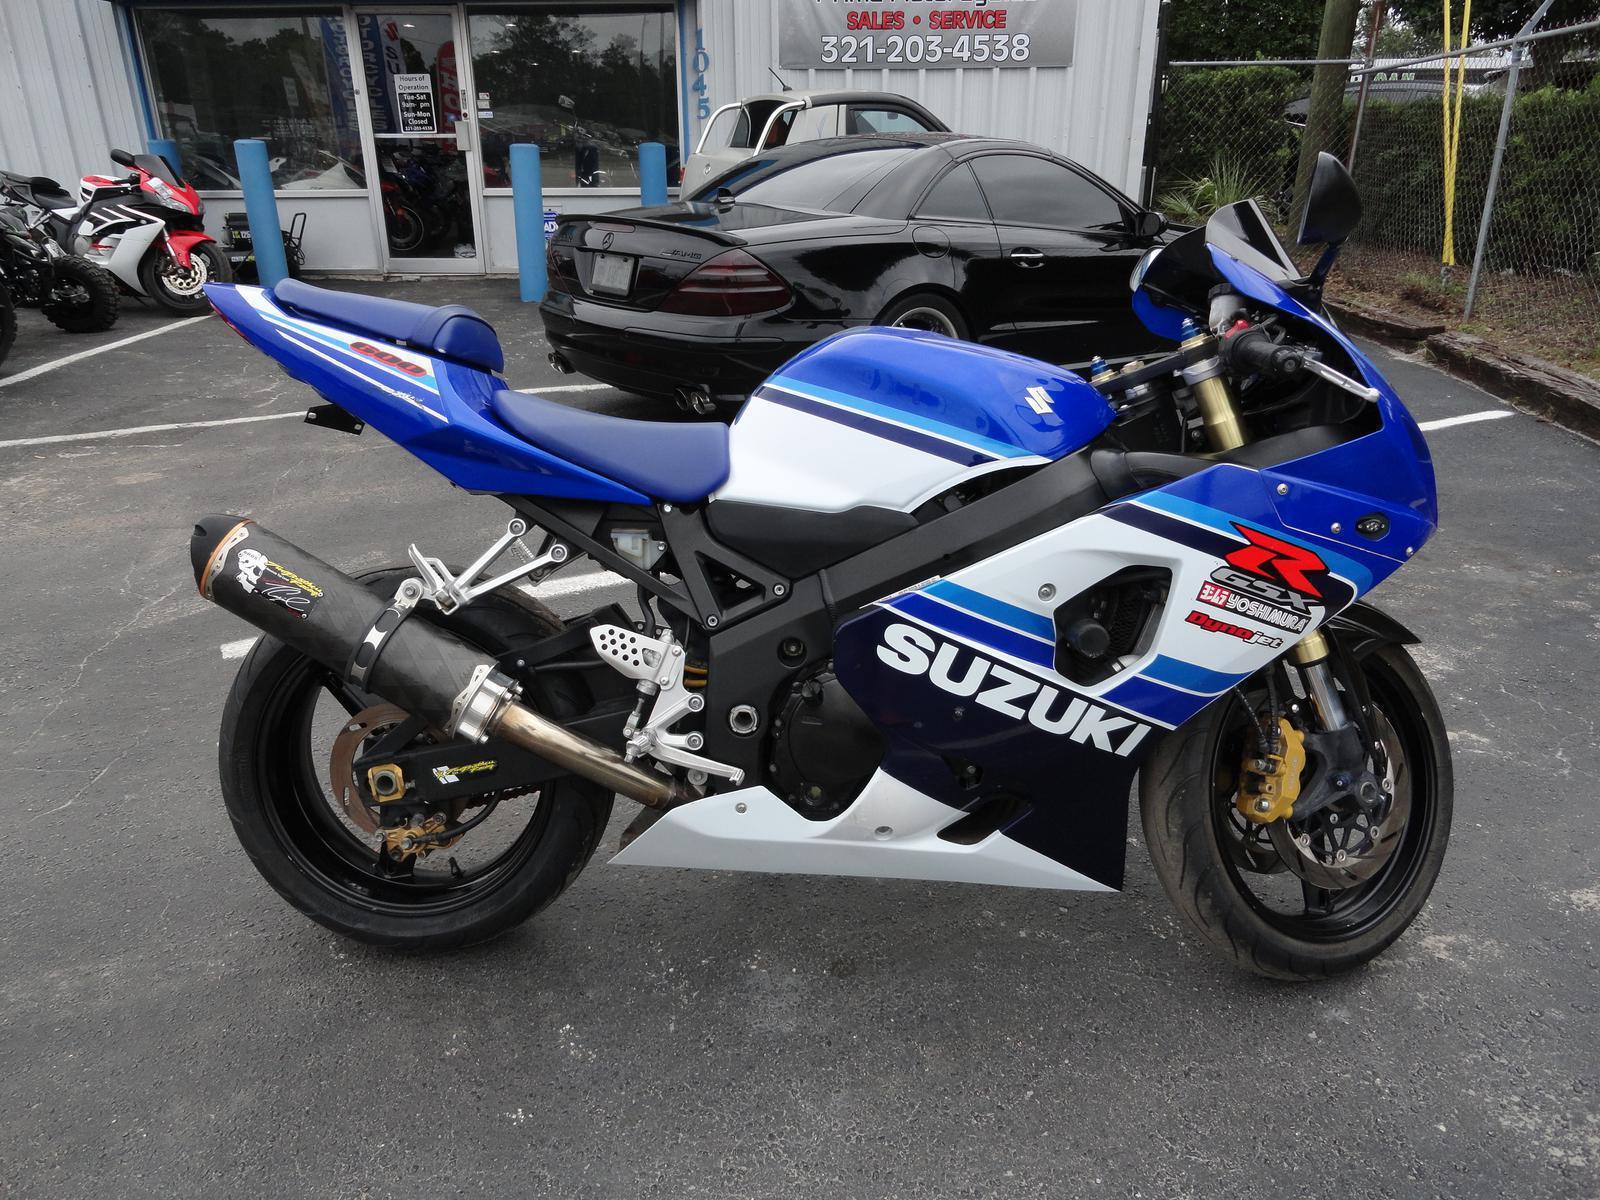 2005 Suzuki GSX-R 600 for sale in Longwood, FL | Prime Motorcycles